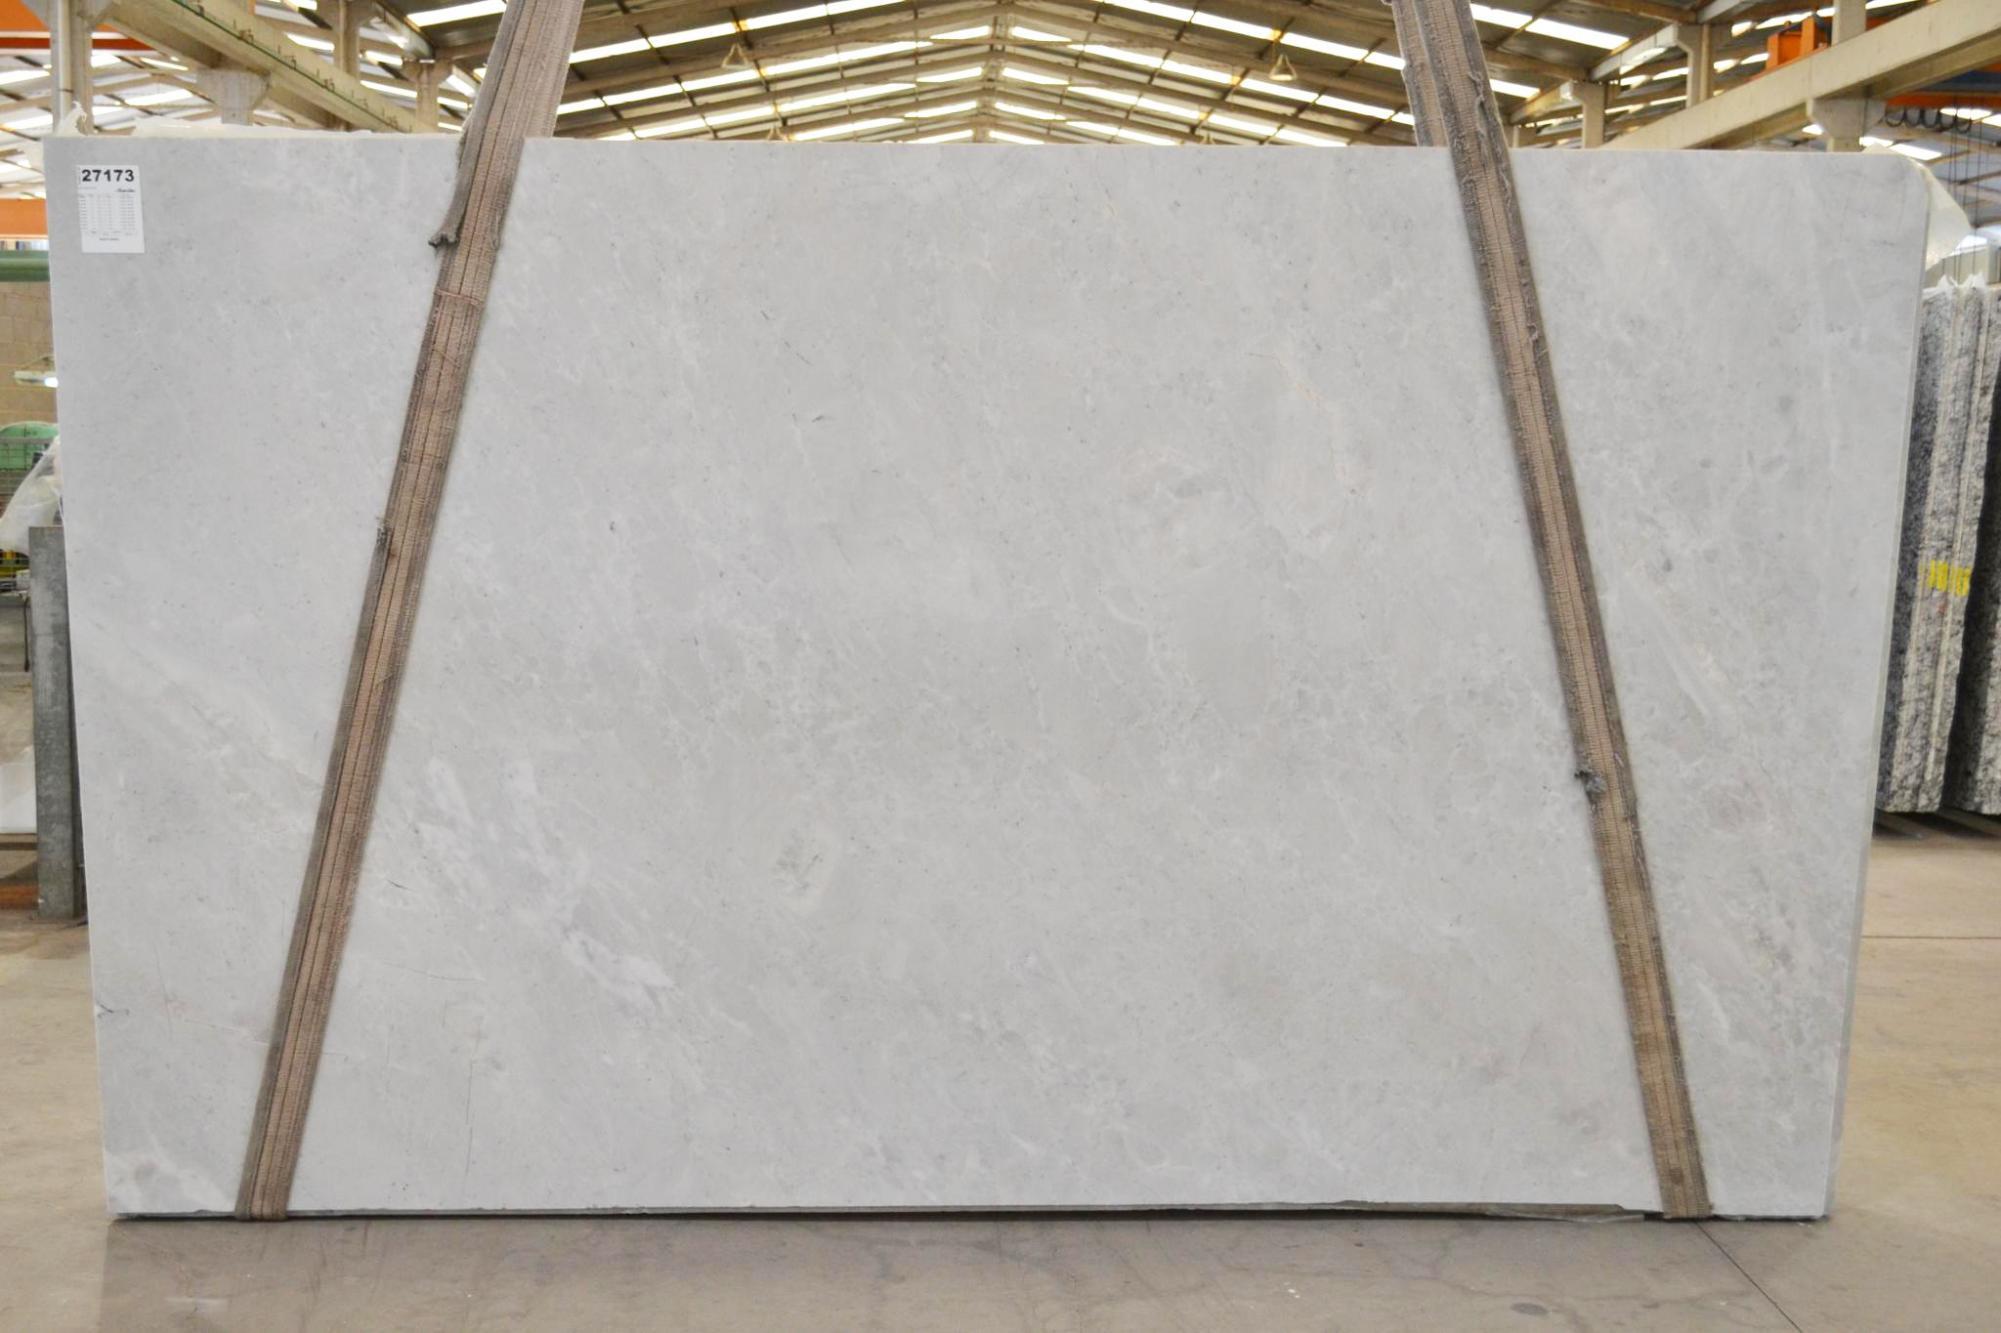 Brazilian Dolomite Supply Espirito Santo (Brazil) polished slabs 2465 , Bnd #27173 natural Dolomite